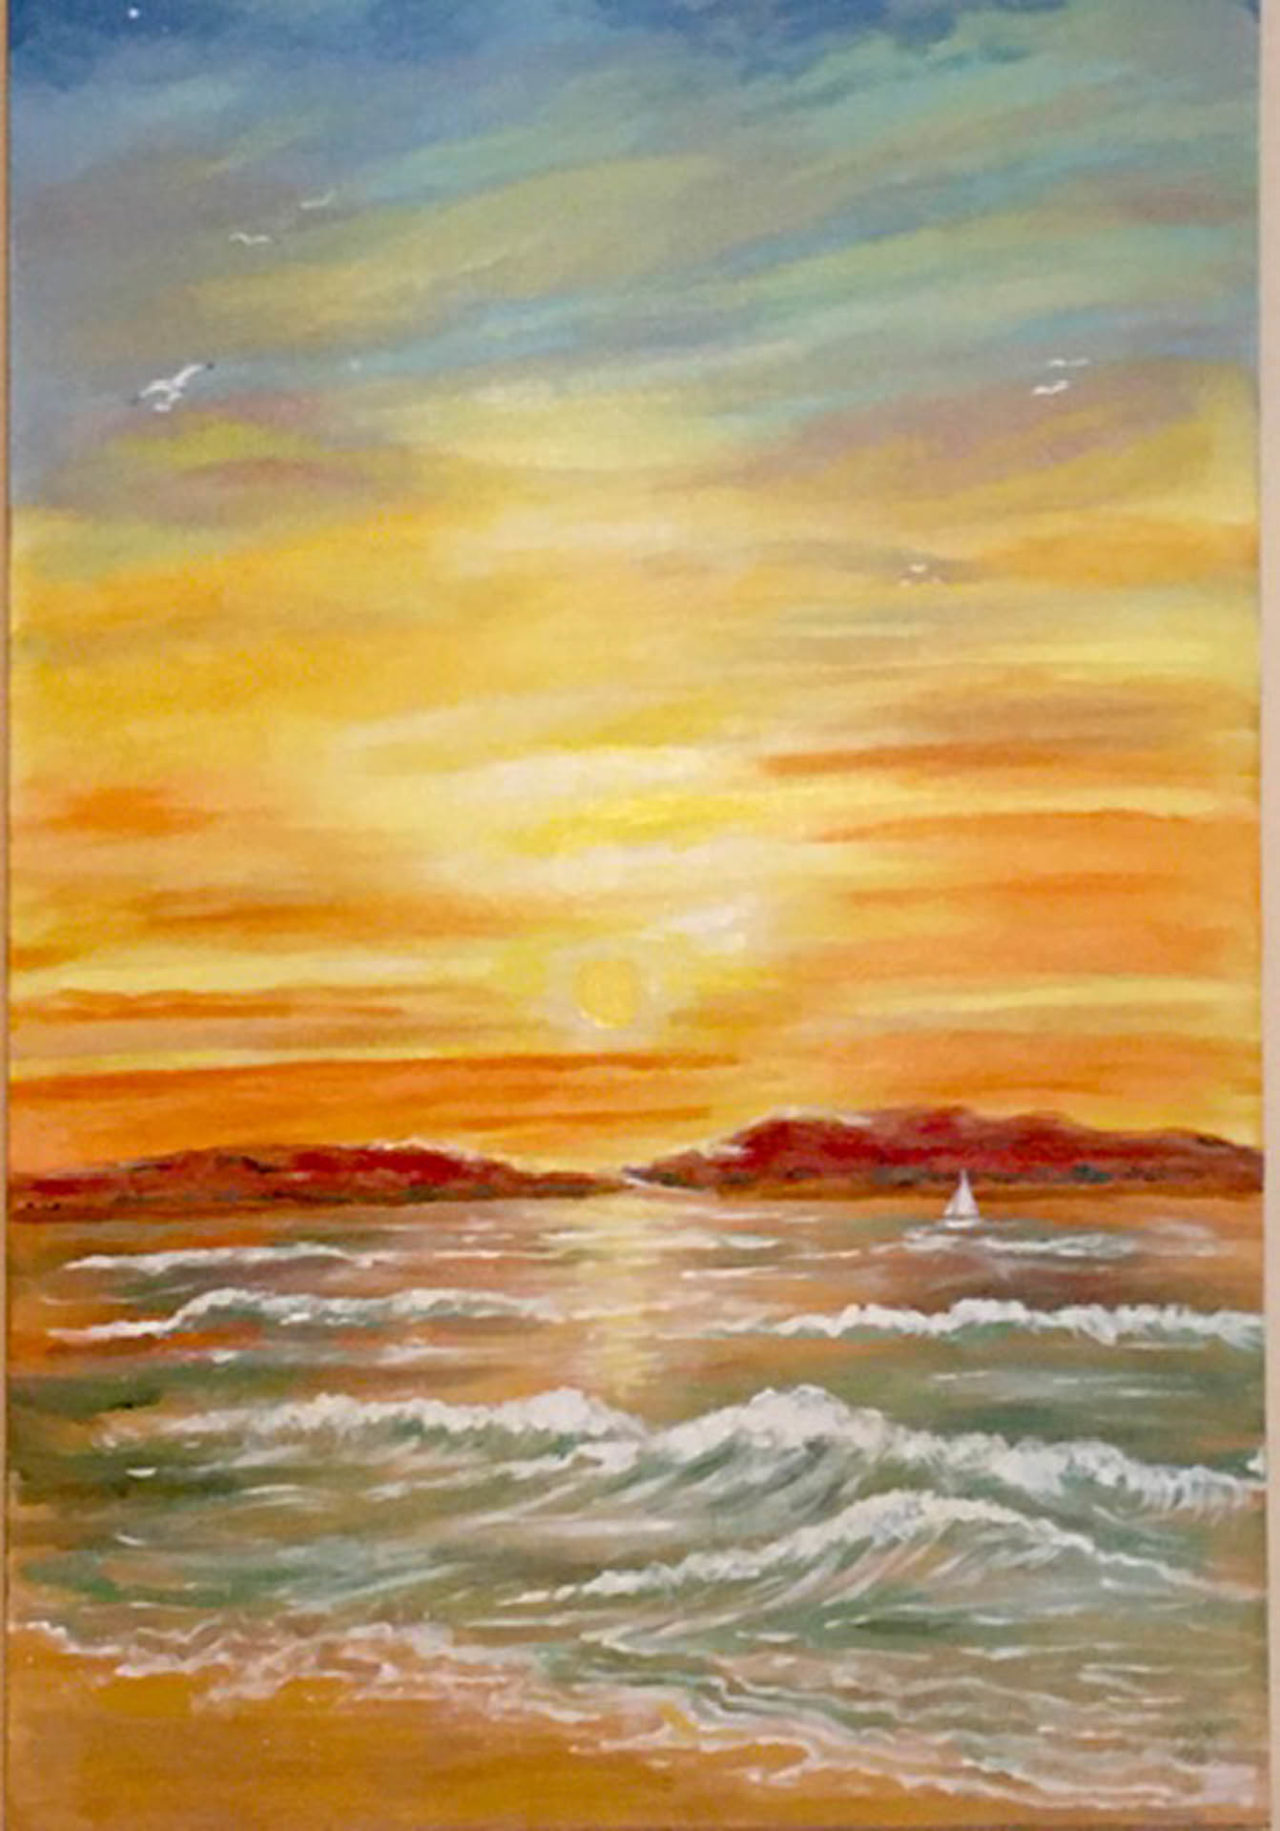 The Splendor of Sunset - Laura Gonzalez